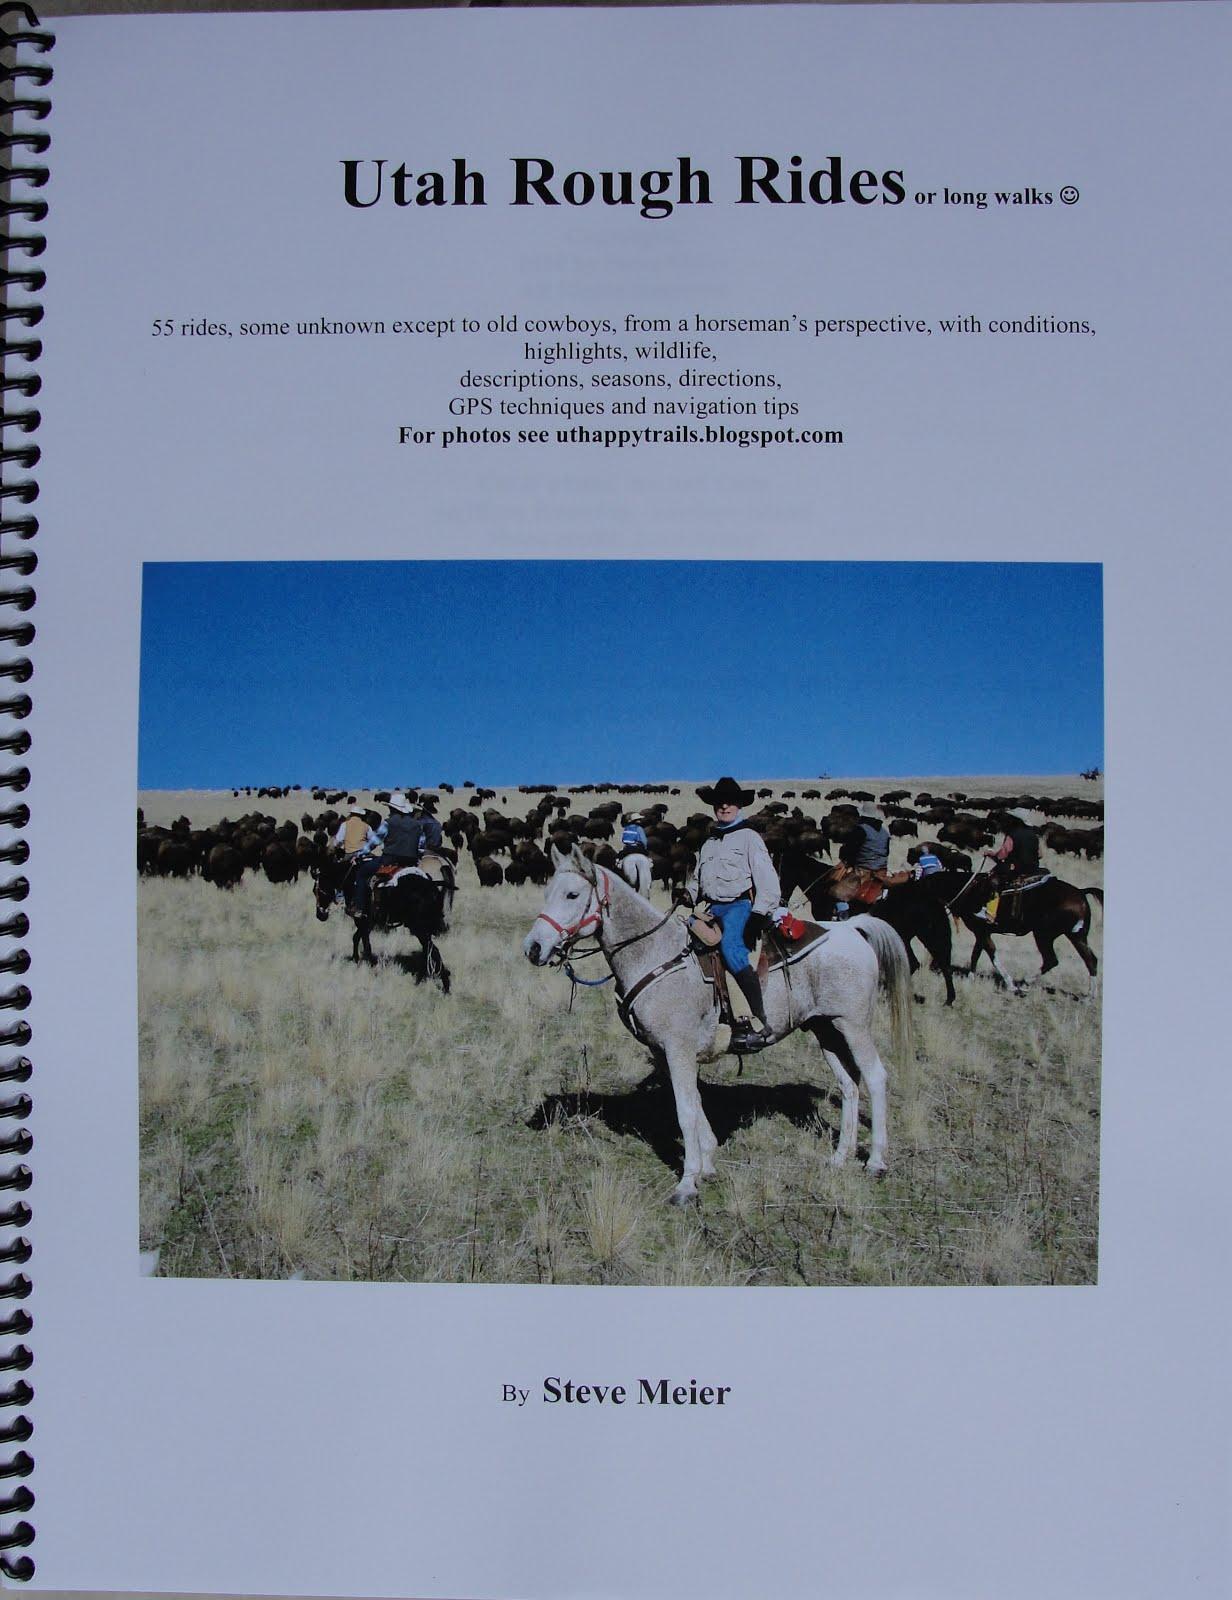 Utah Rough Rides